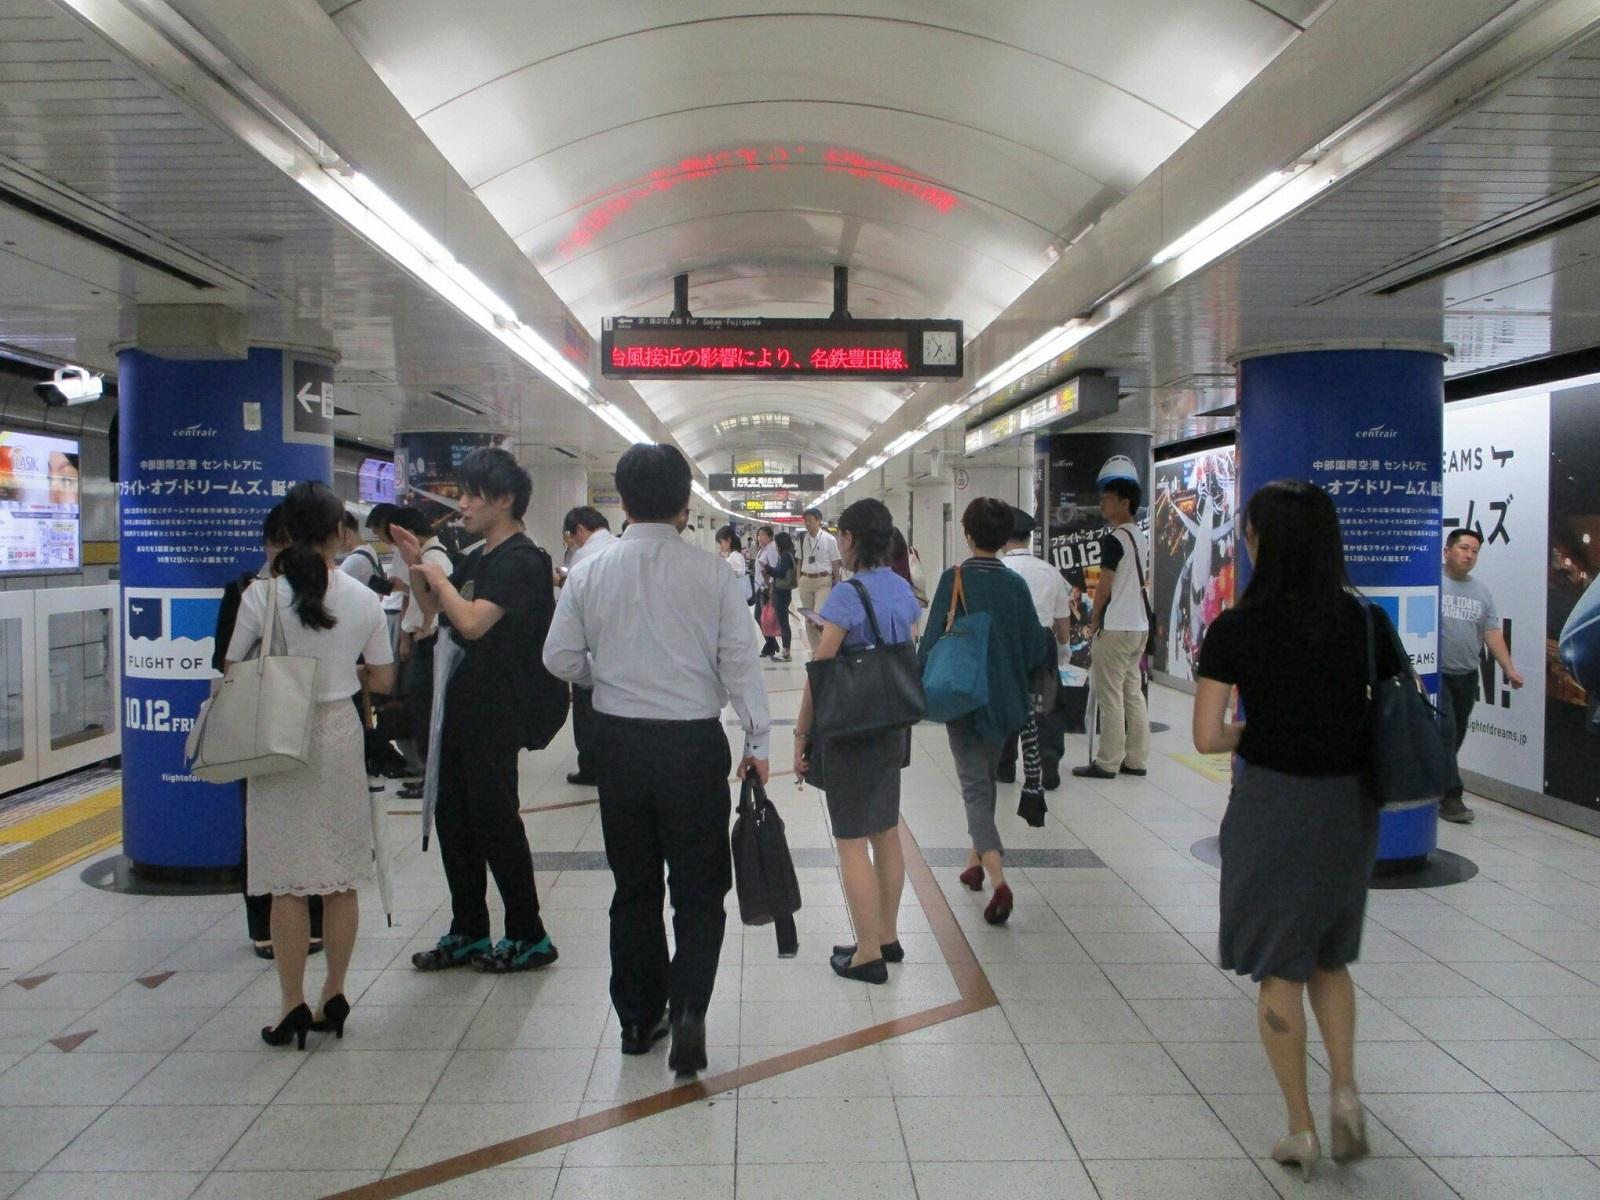 2018.9.4 (71) 名古屋 - 「台風接近の…」 1600-1200